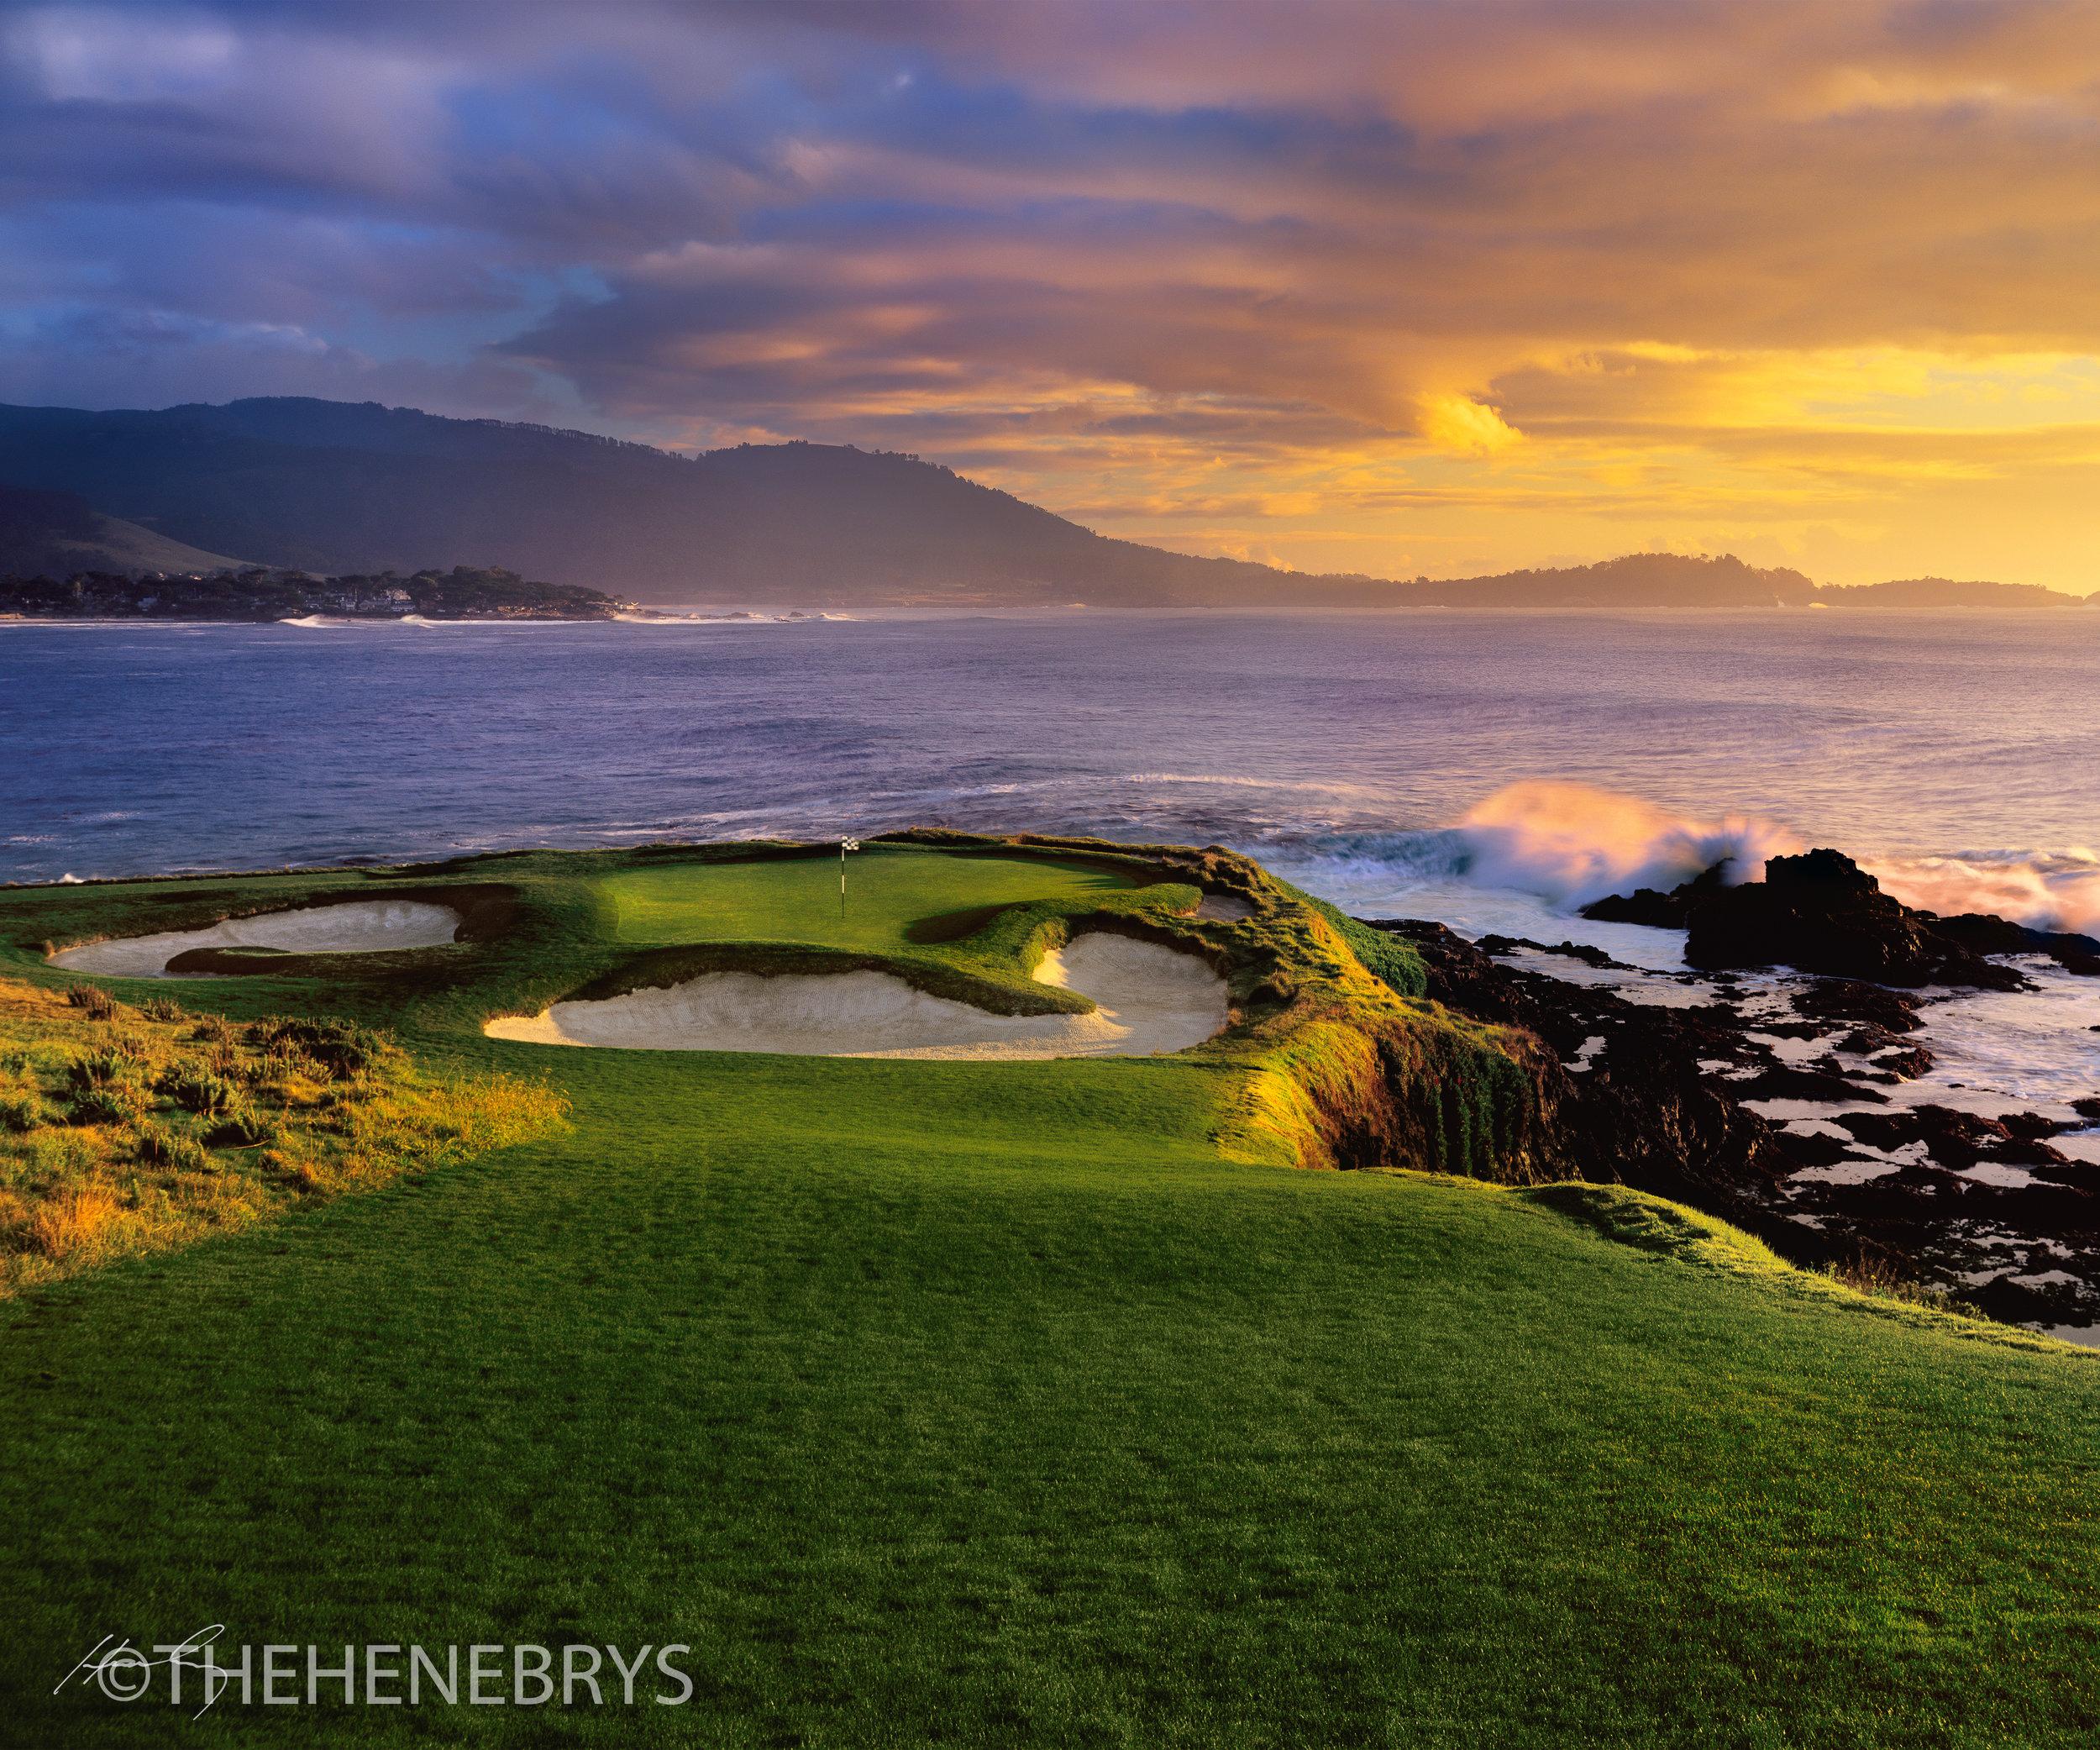 """Magical"" #07 Pebble Beach Golf Links®, California"